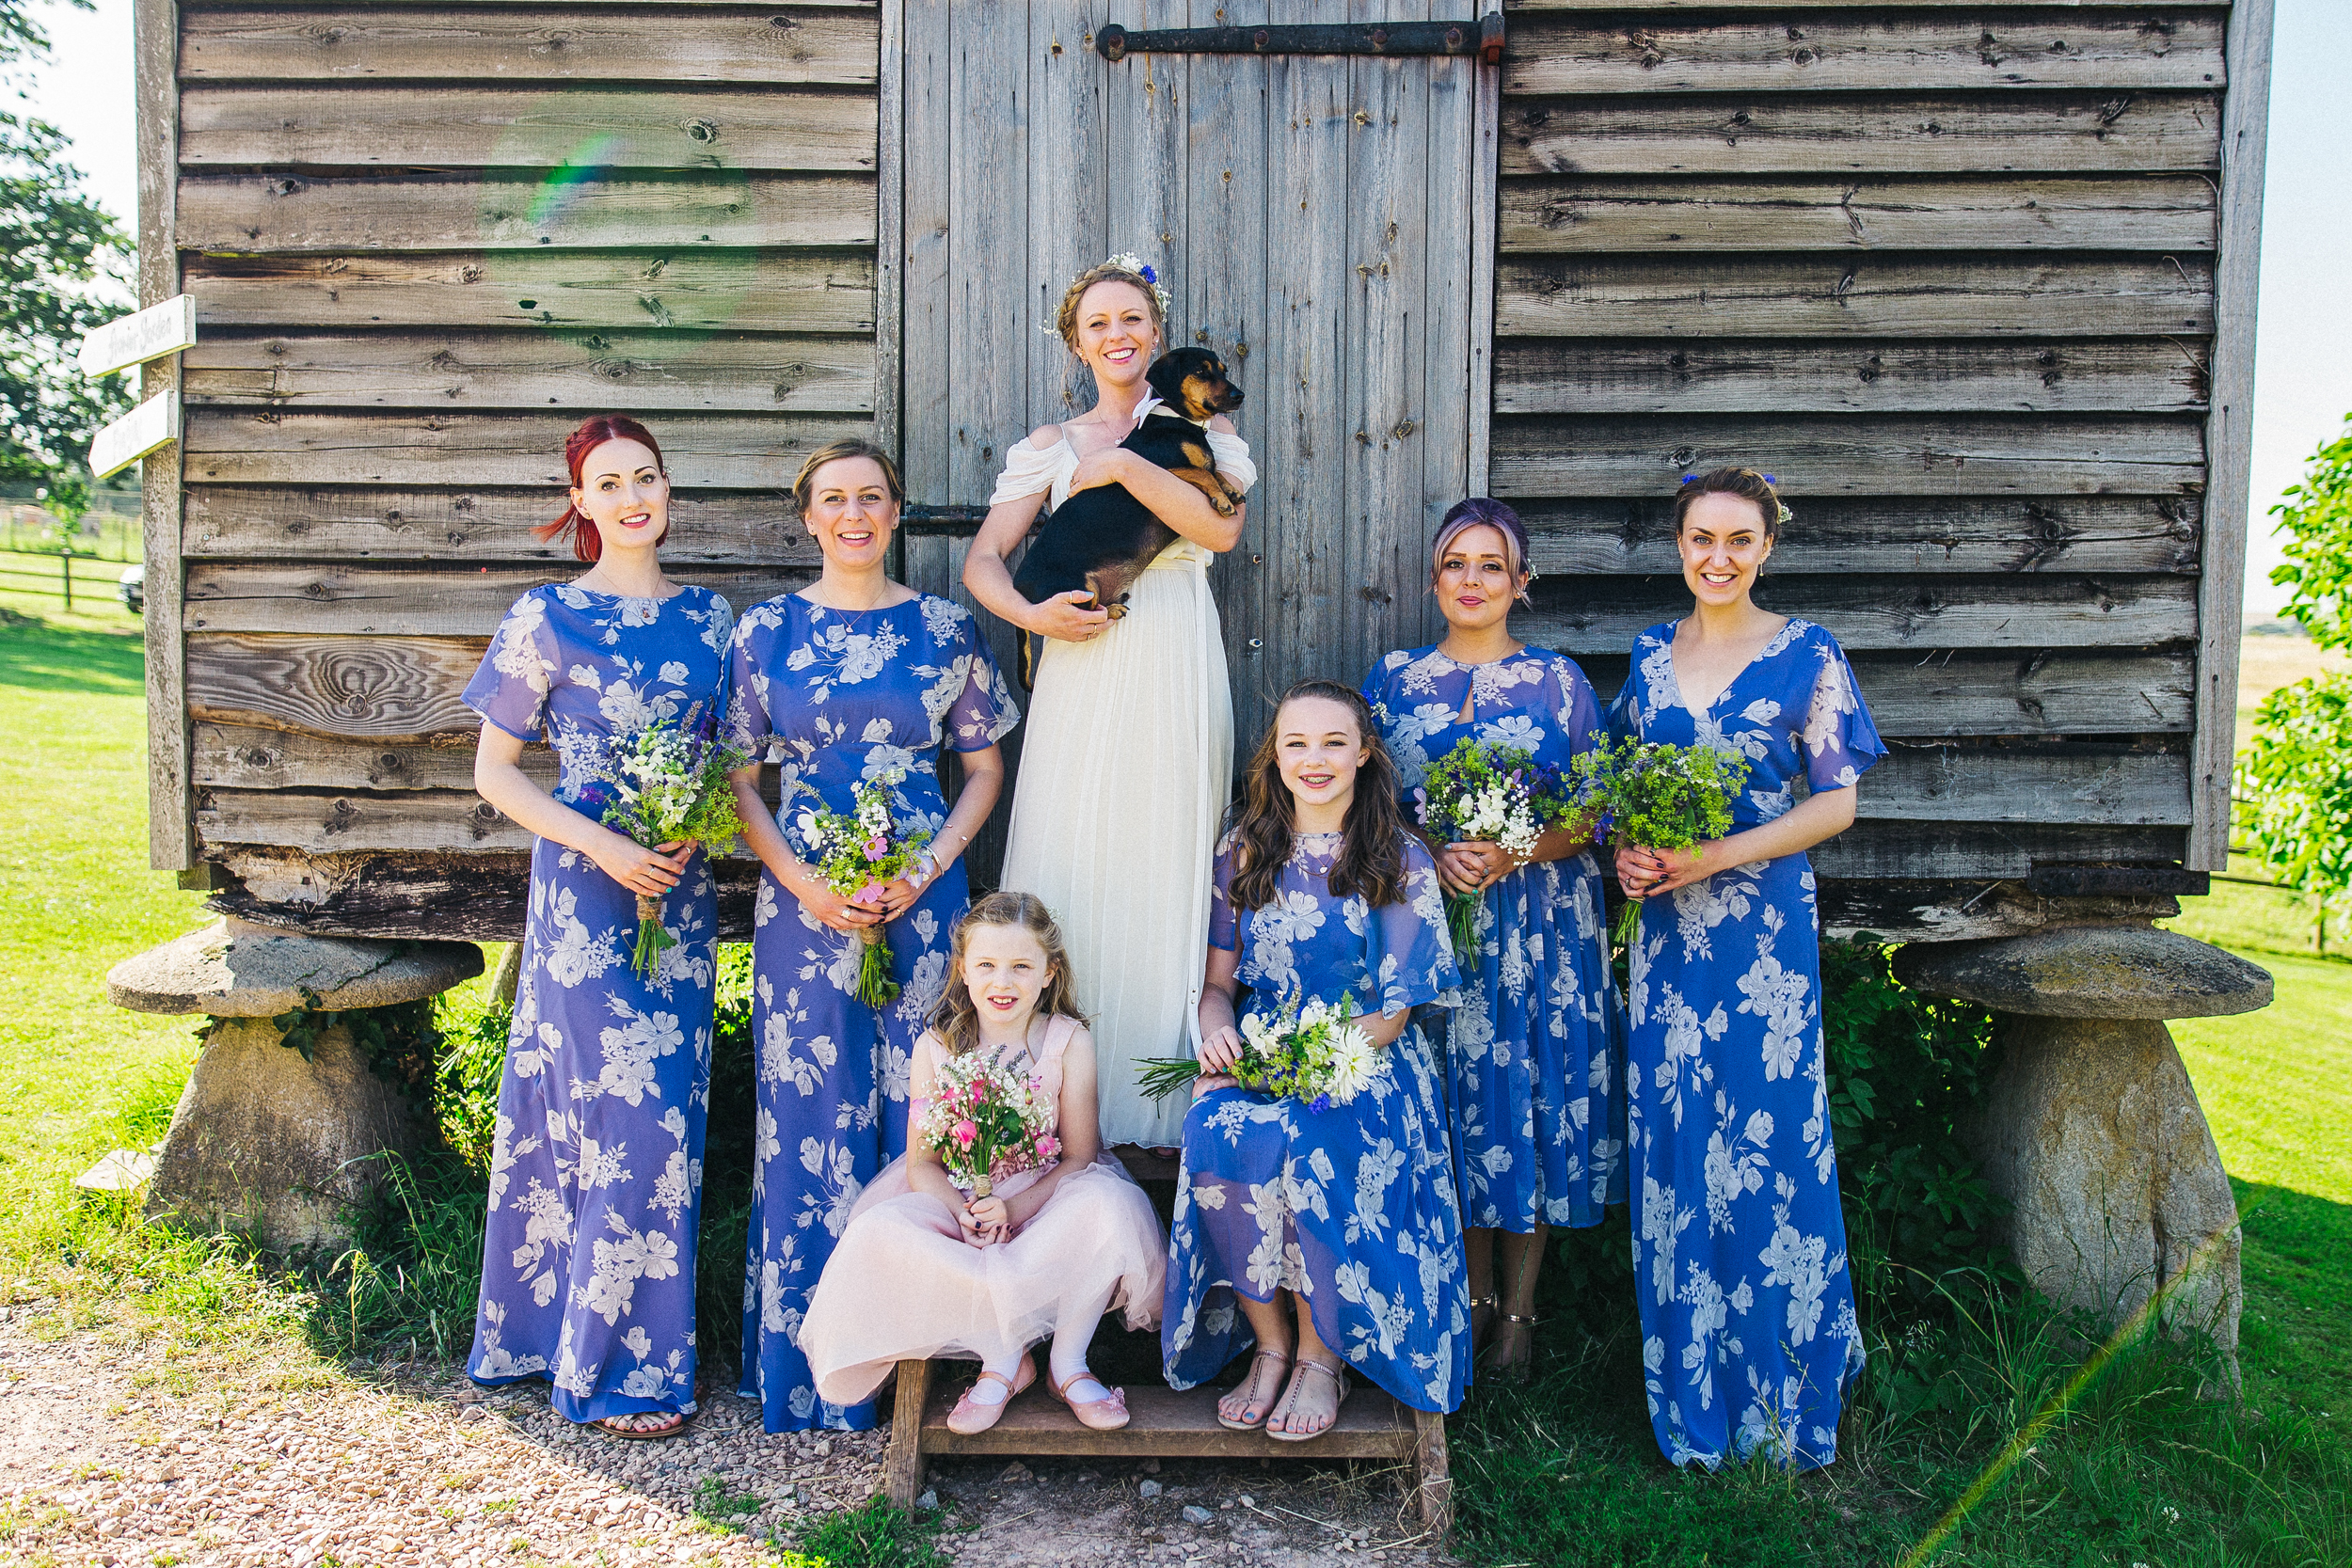 creative-wedding-photography-teesside-north-east-yorkshire-80.jpg